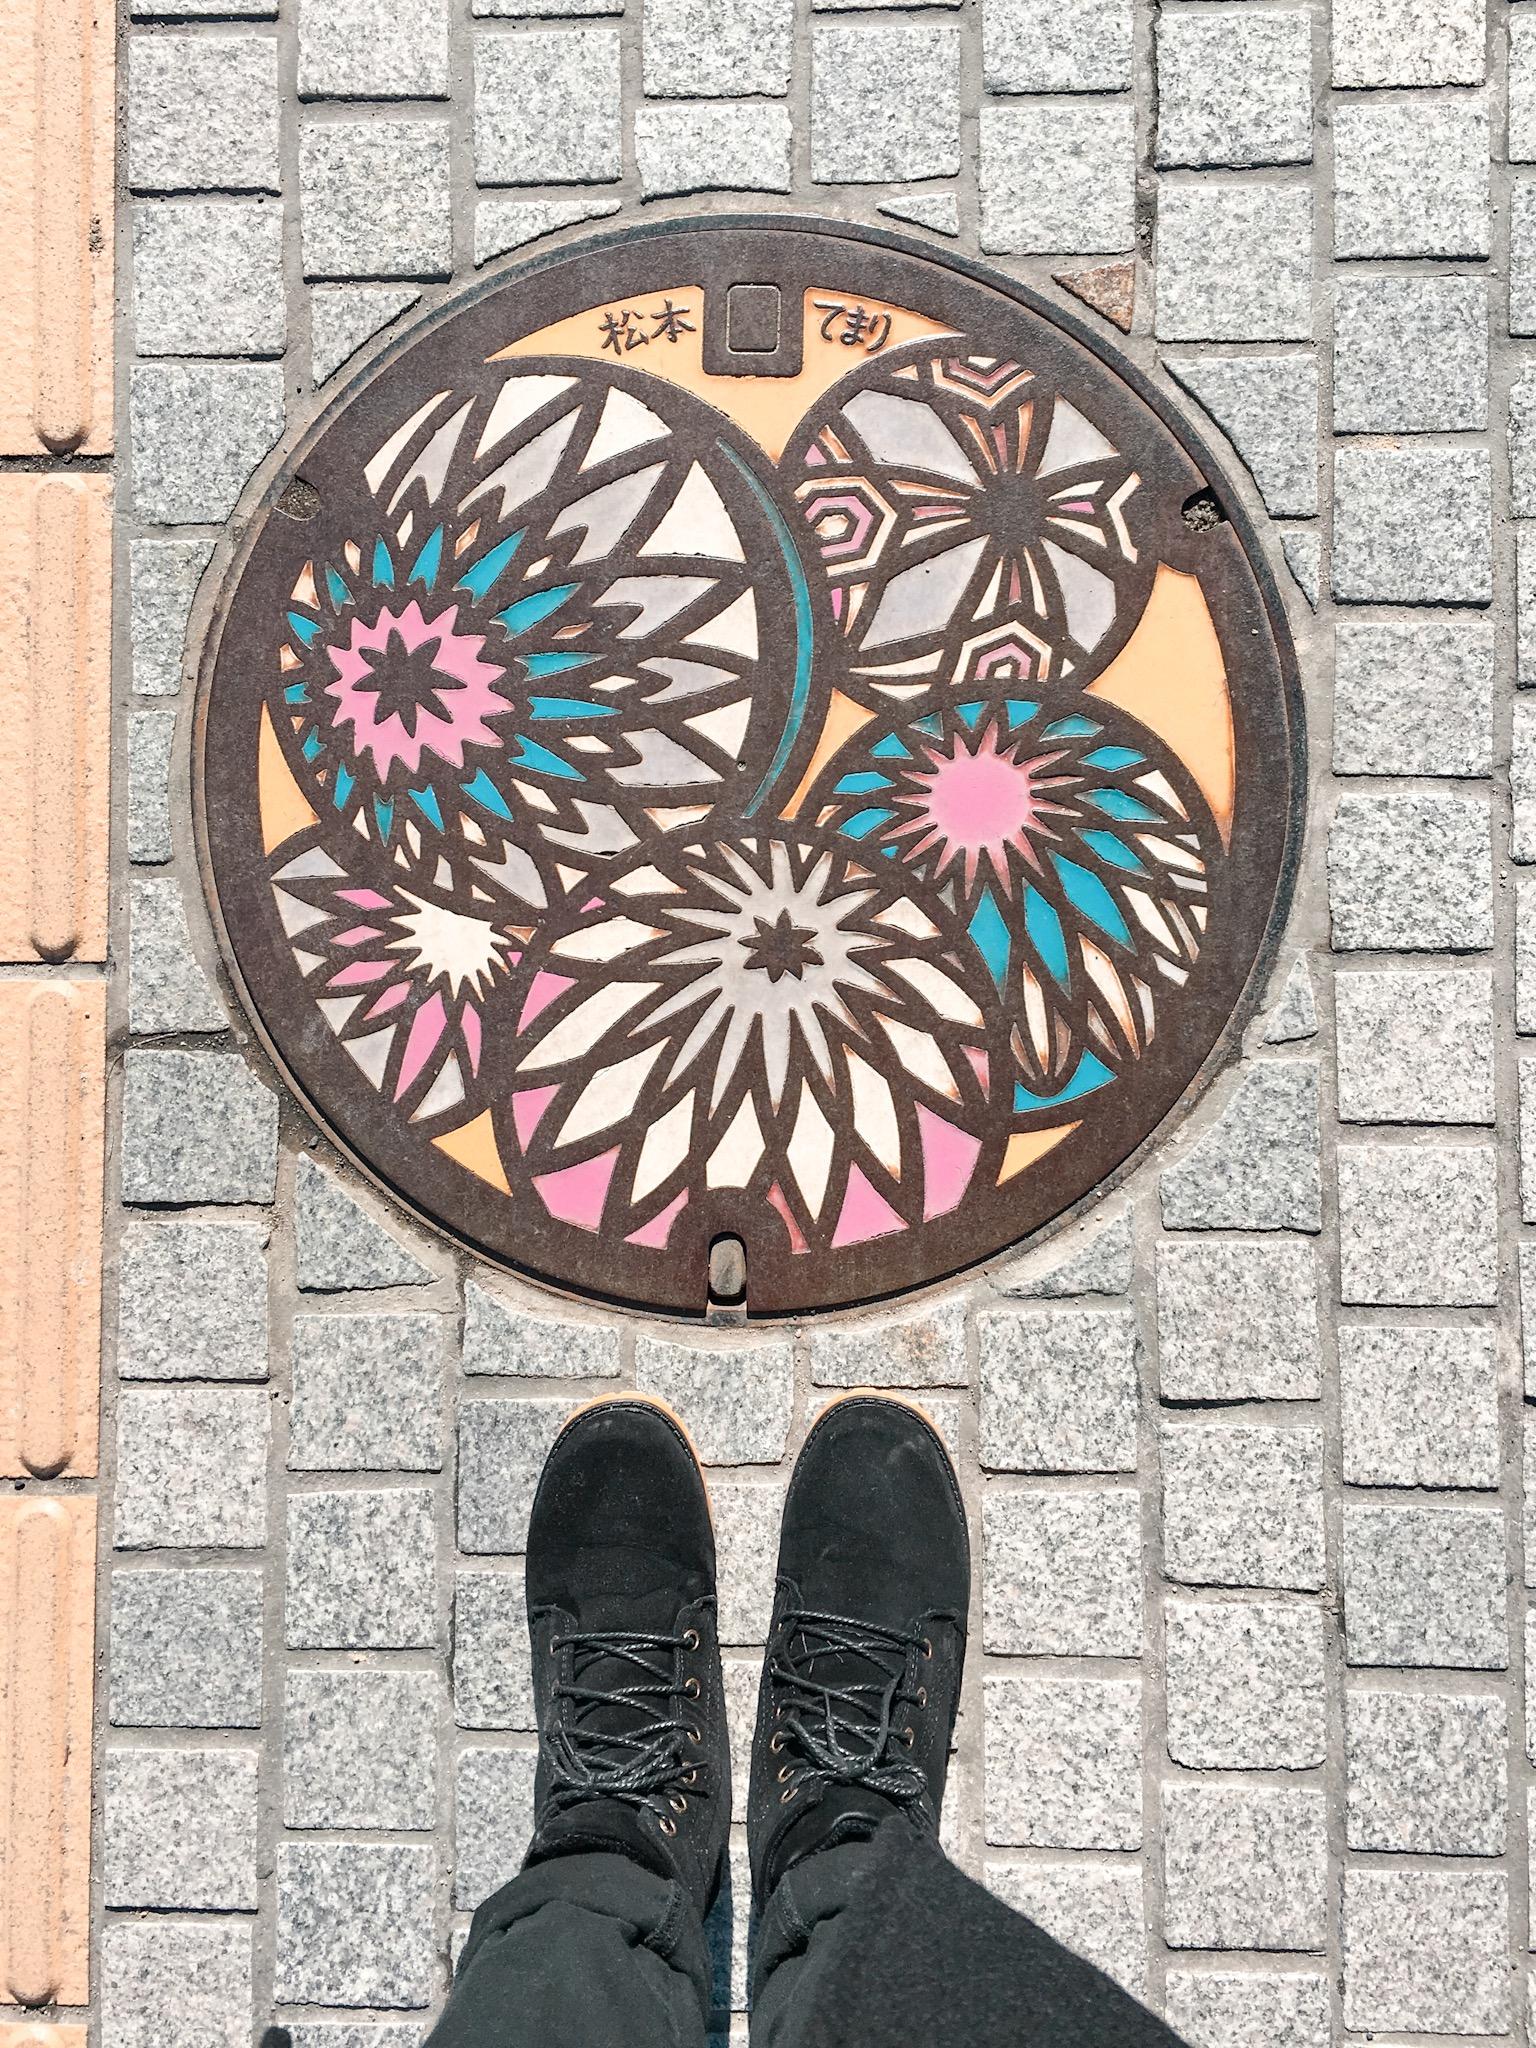 Matsumoto, Nagano, Japan